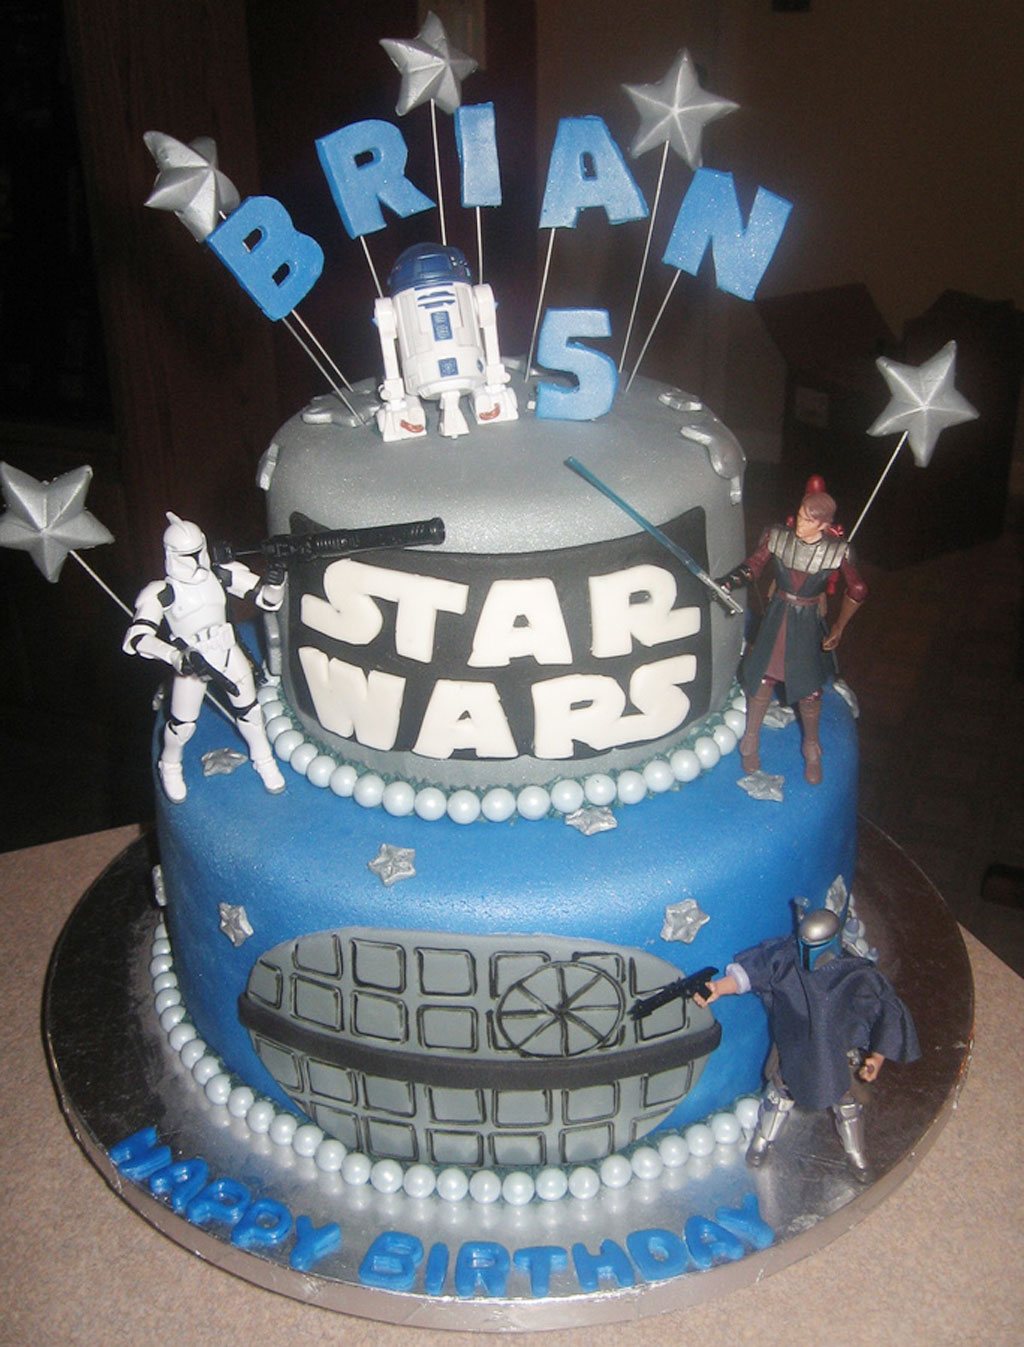 Star Wars Birthday Cakes Birthday Cake - Cake Ideas by ...